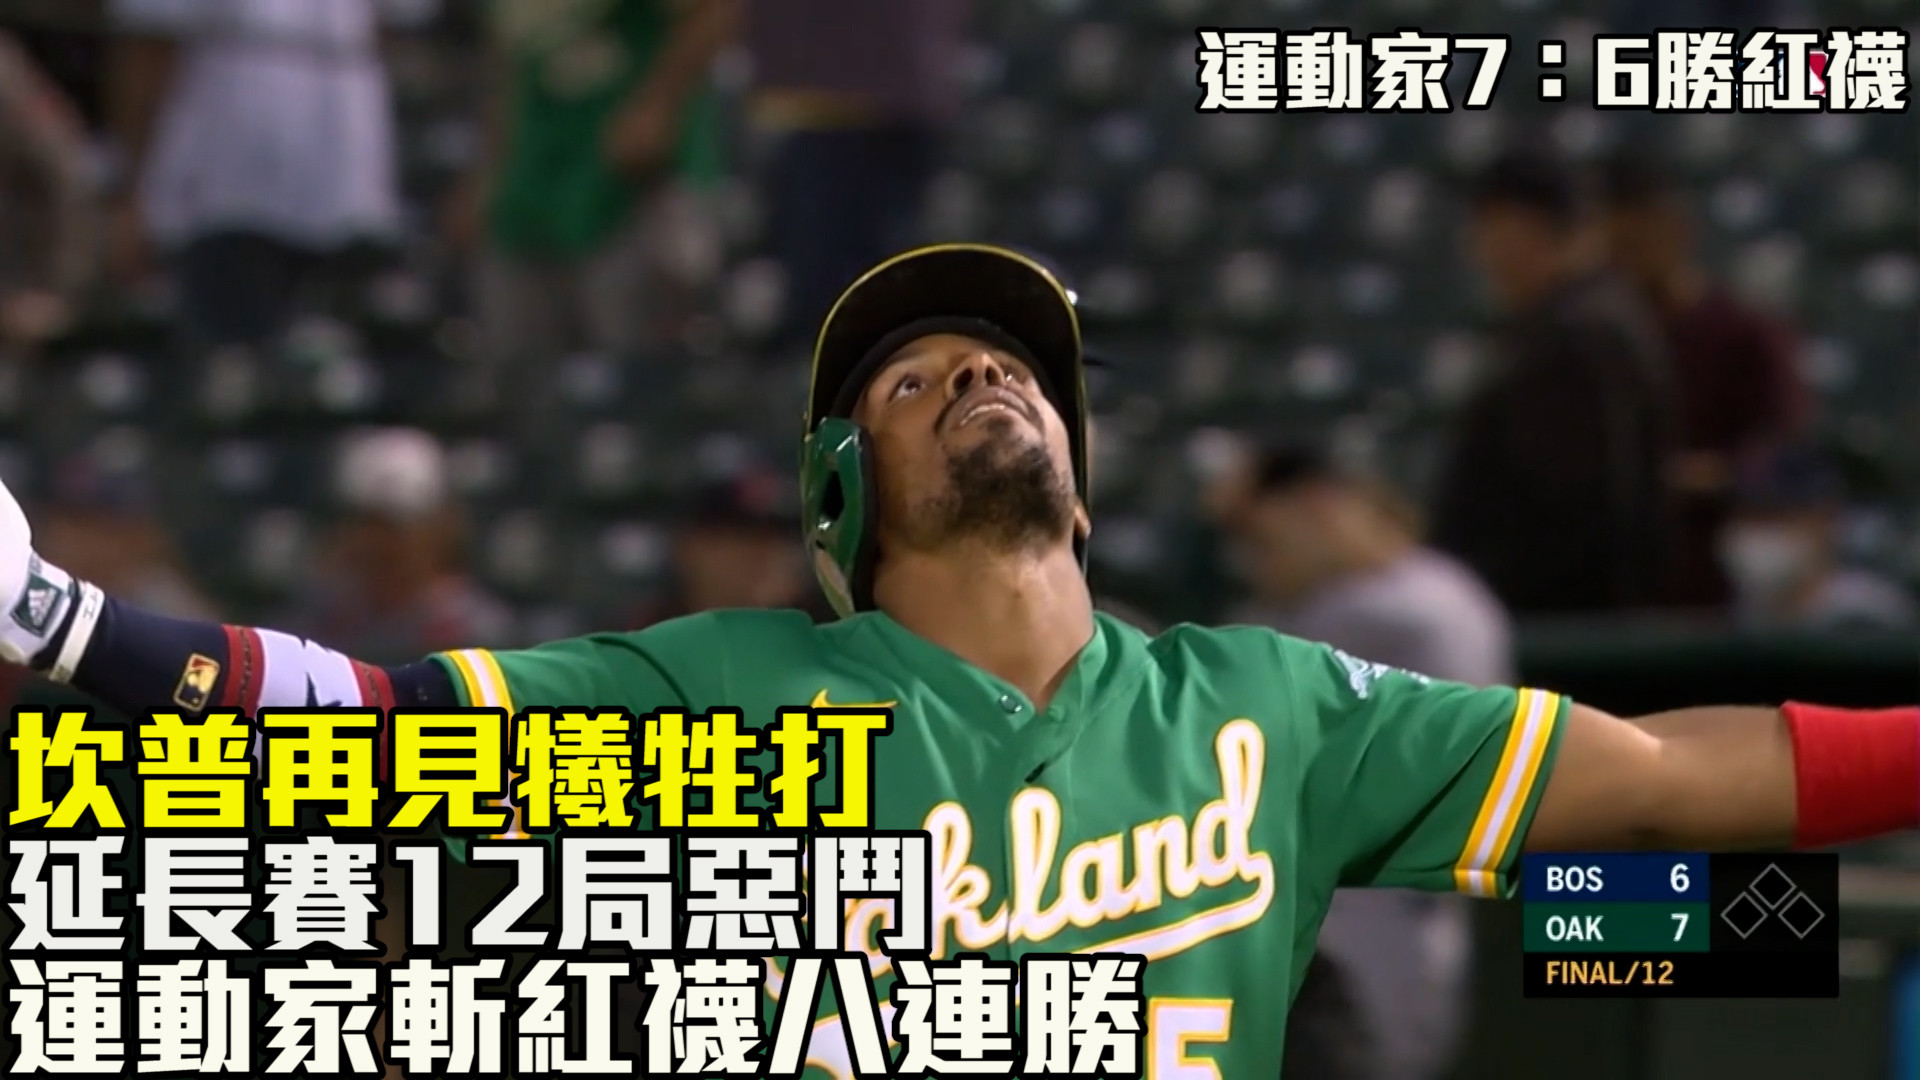 【MLB看愛爾達】坎普再見犧牲打 運動家延長賽勝紅襪 07/04